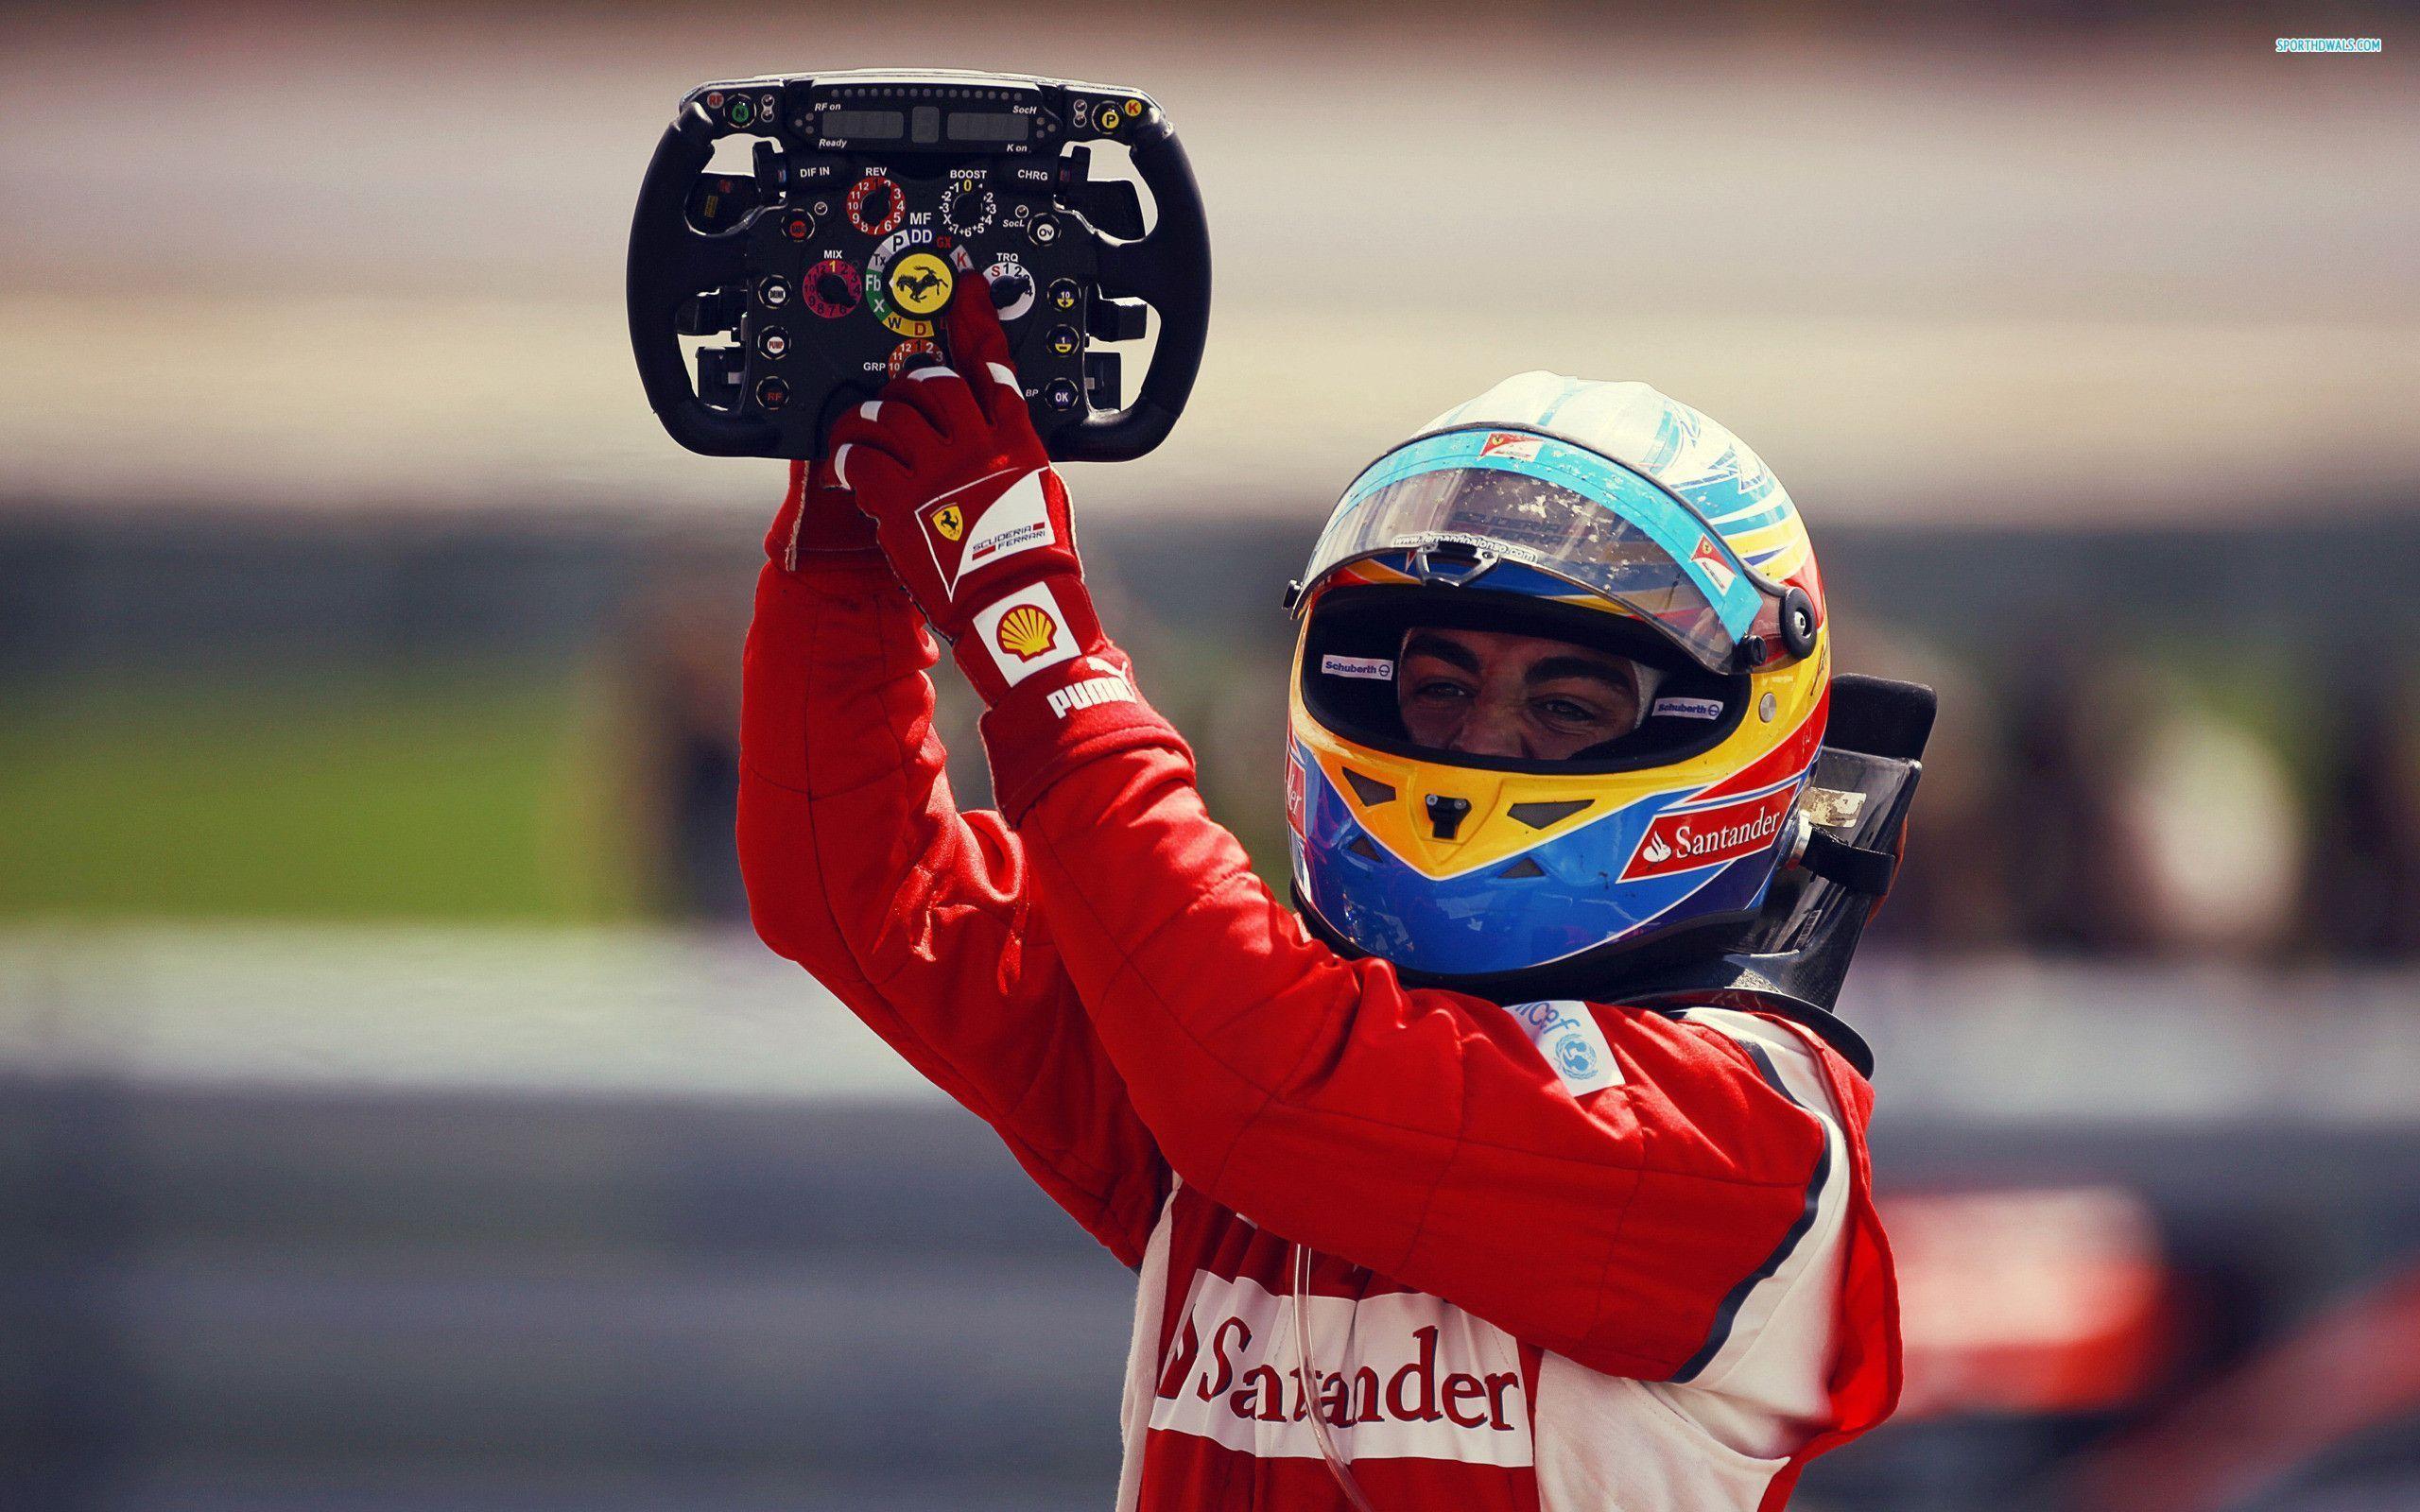 Fernando Alonso Wallpapers 2560x1600